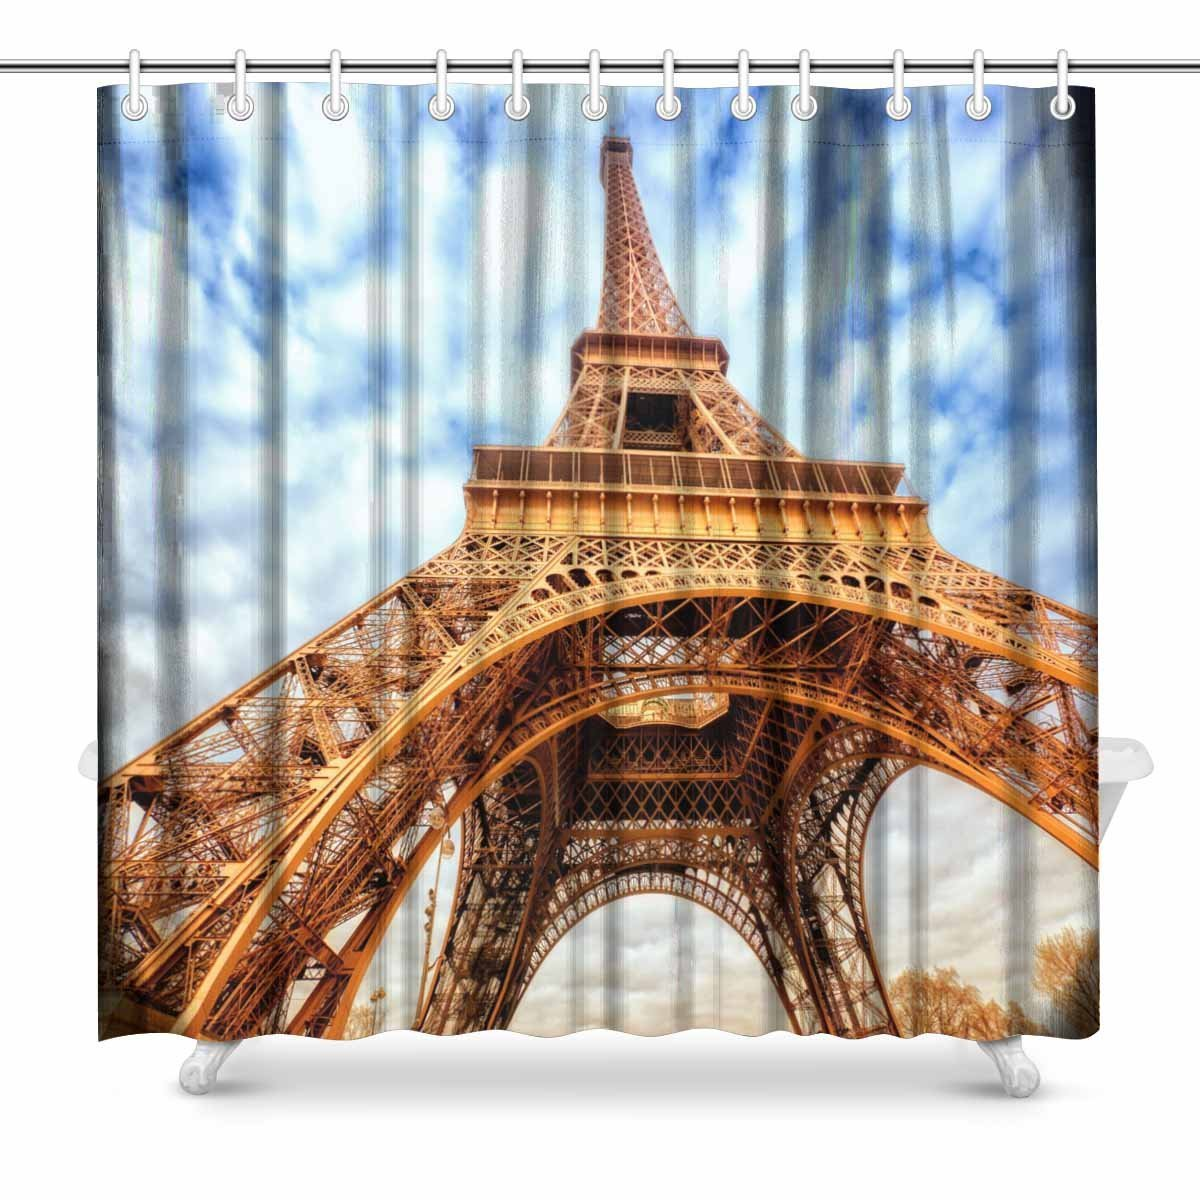 Populair Merk Aplysia Eiffeltoren Parijs Frankrijk Badkamer Douchegordijn Accessoires 72 Inches